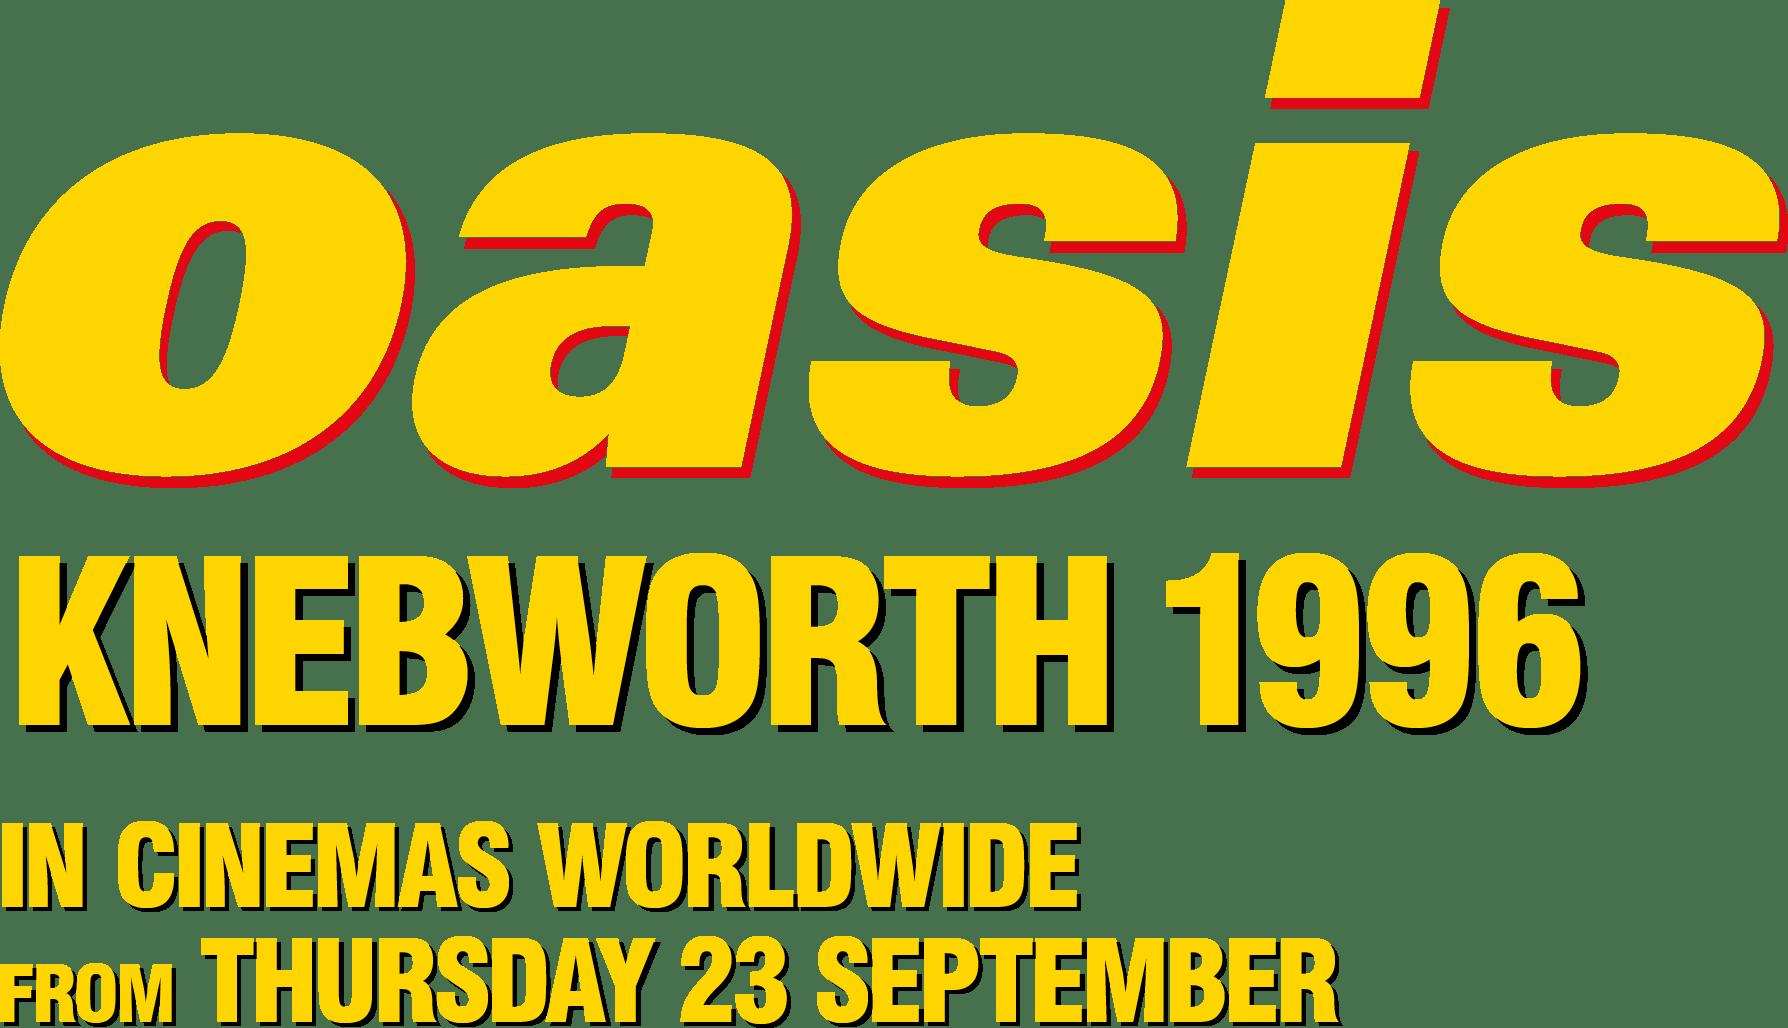 Oasis Knebworth 1996 : %$SYNOPSIS% | Trafalgar Releasing